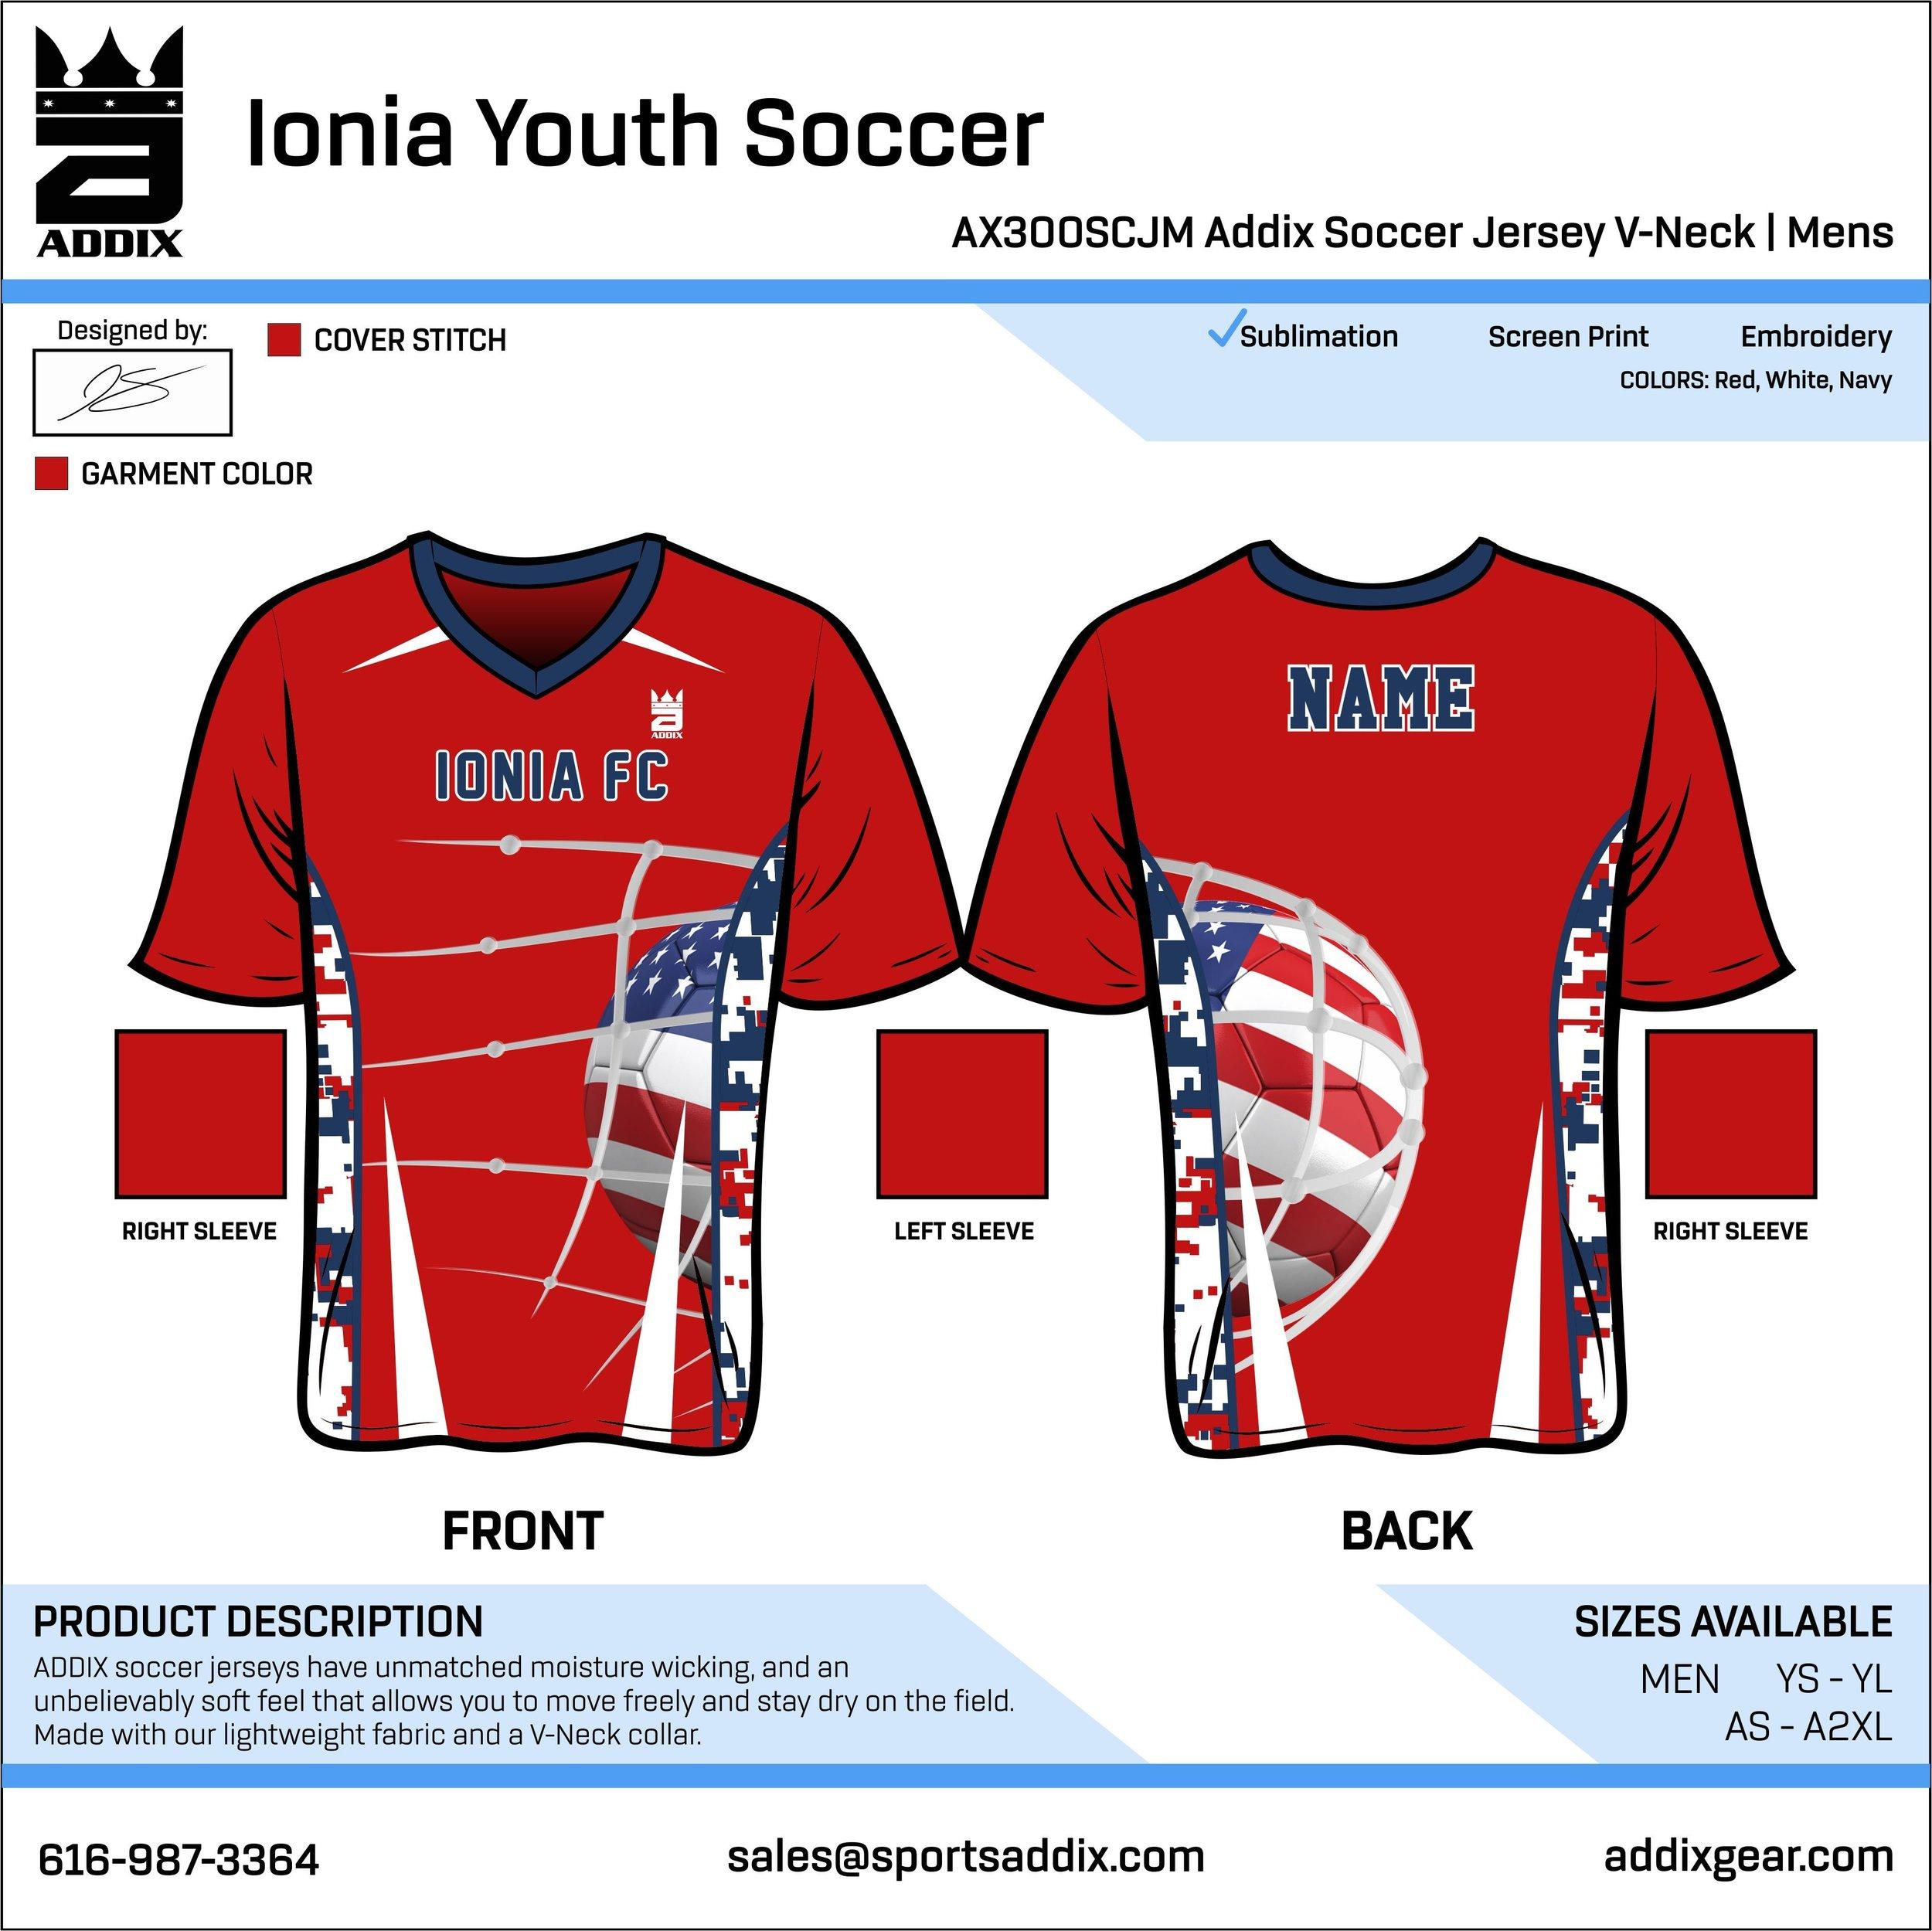 Jerseys won by Ionia FC. -